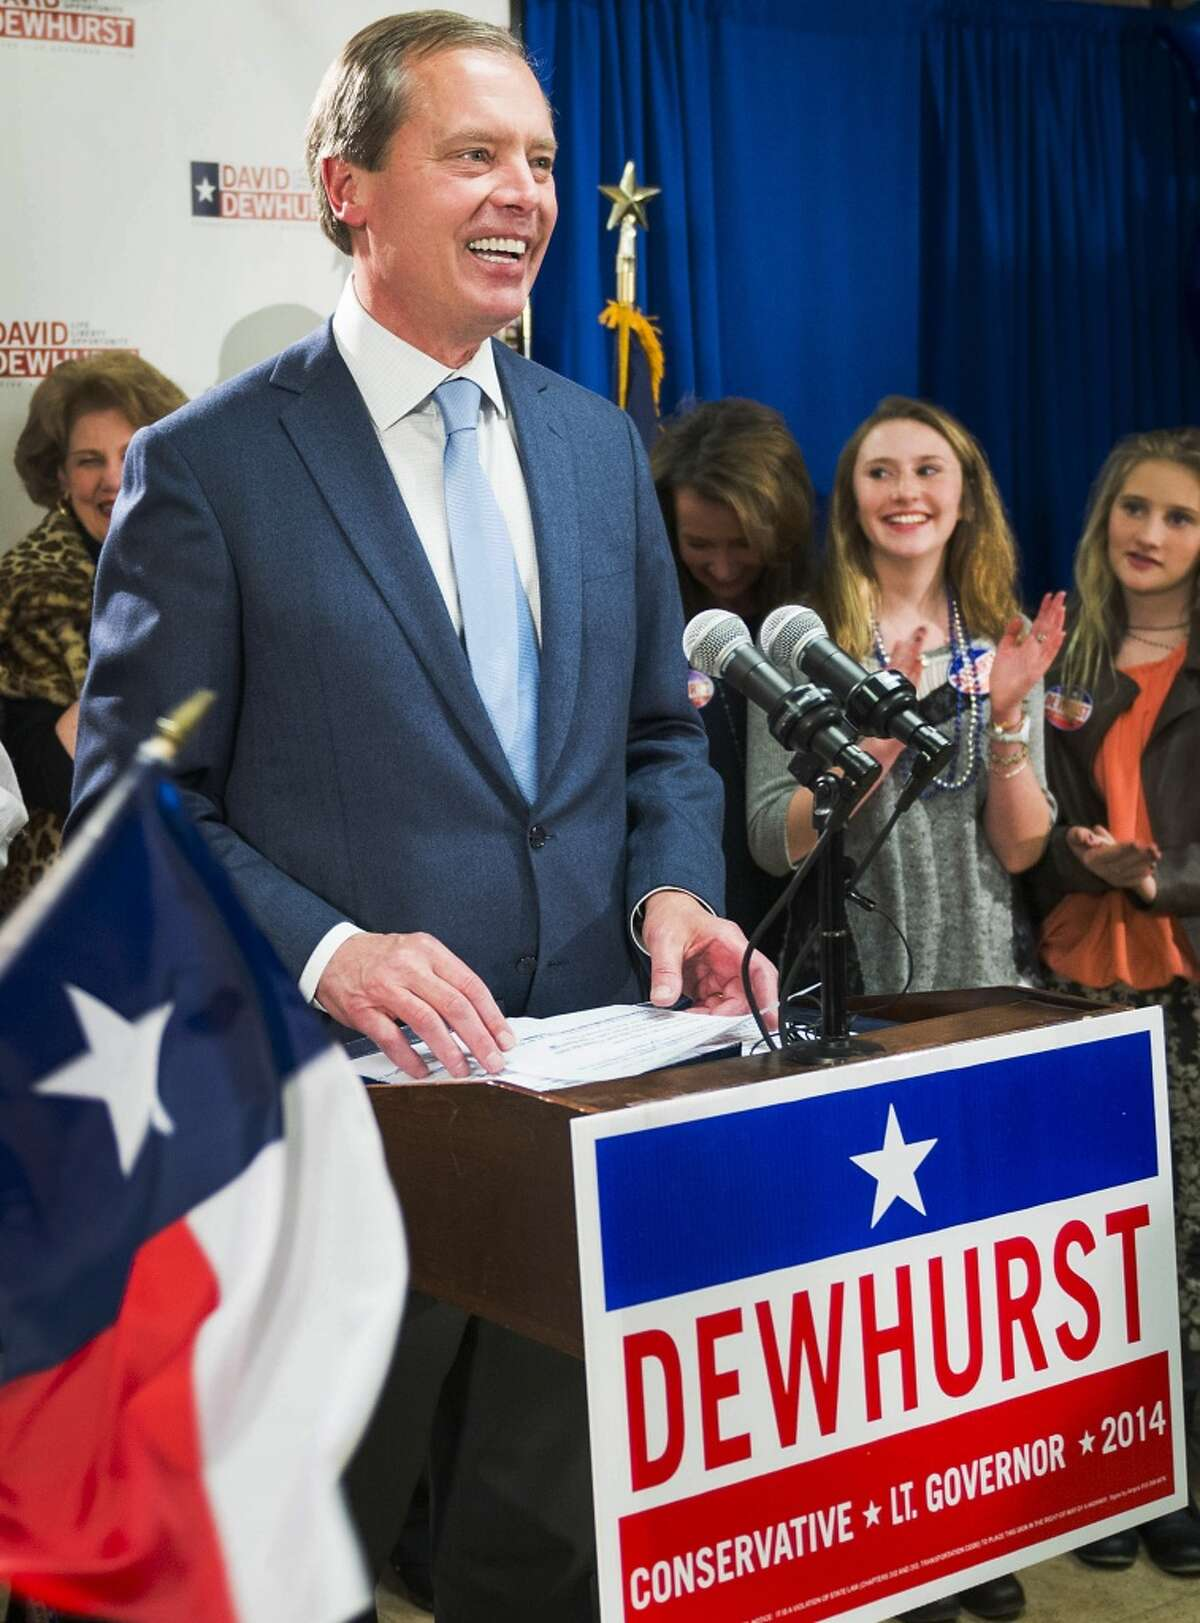 David DewhurstTexas Lieutenant Governor Compensation: $7,200Source: Texas Tribune